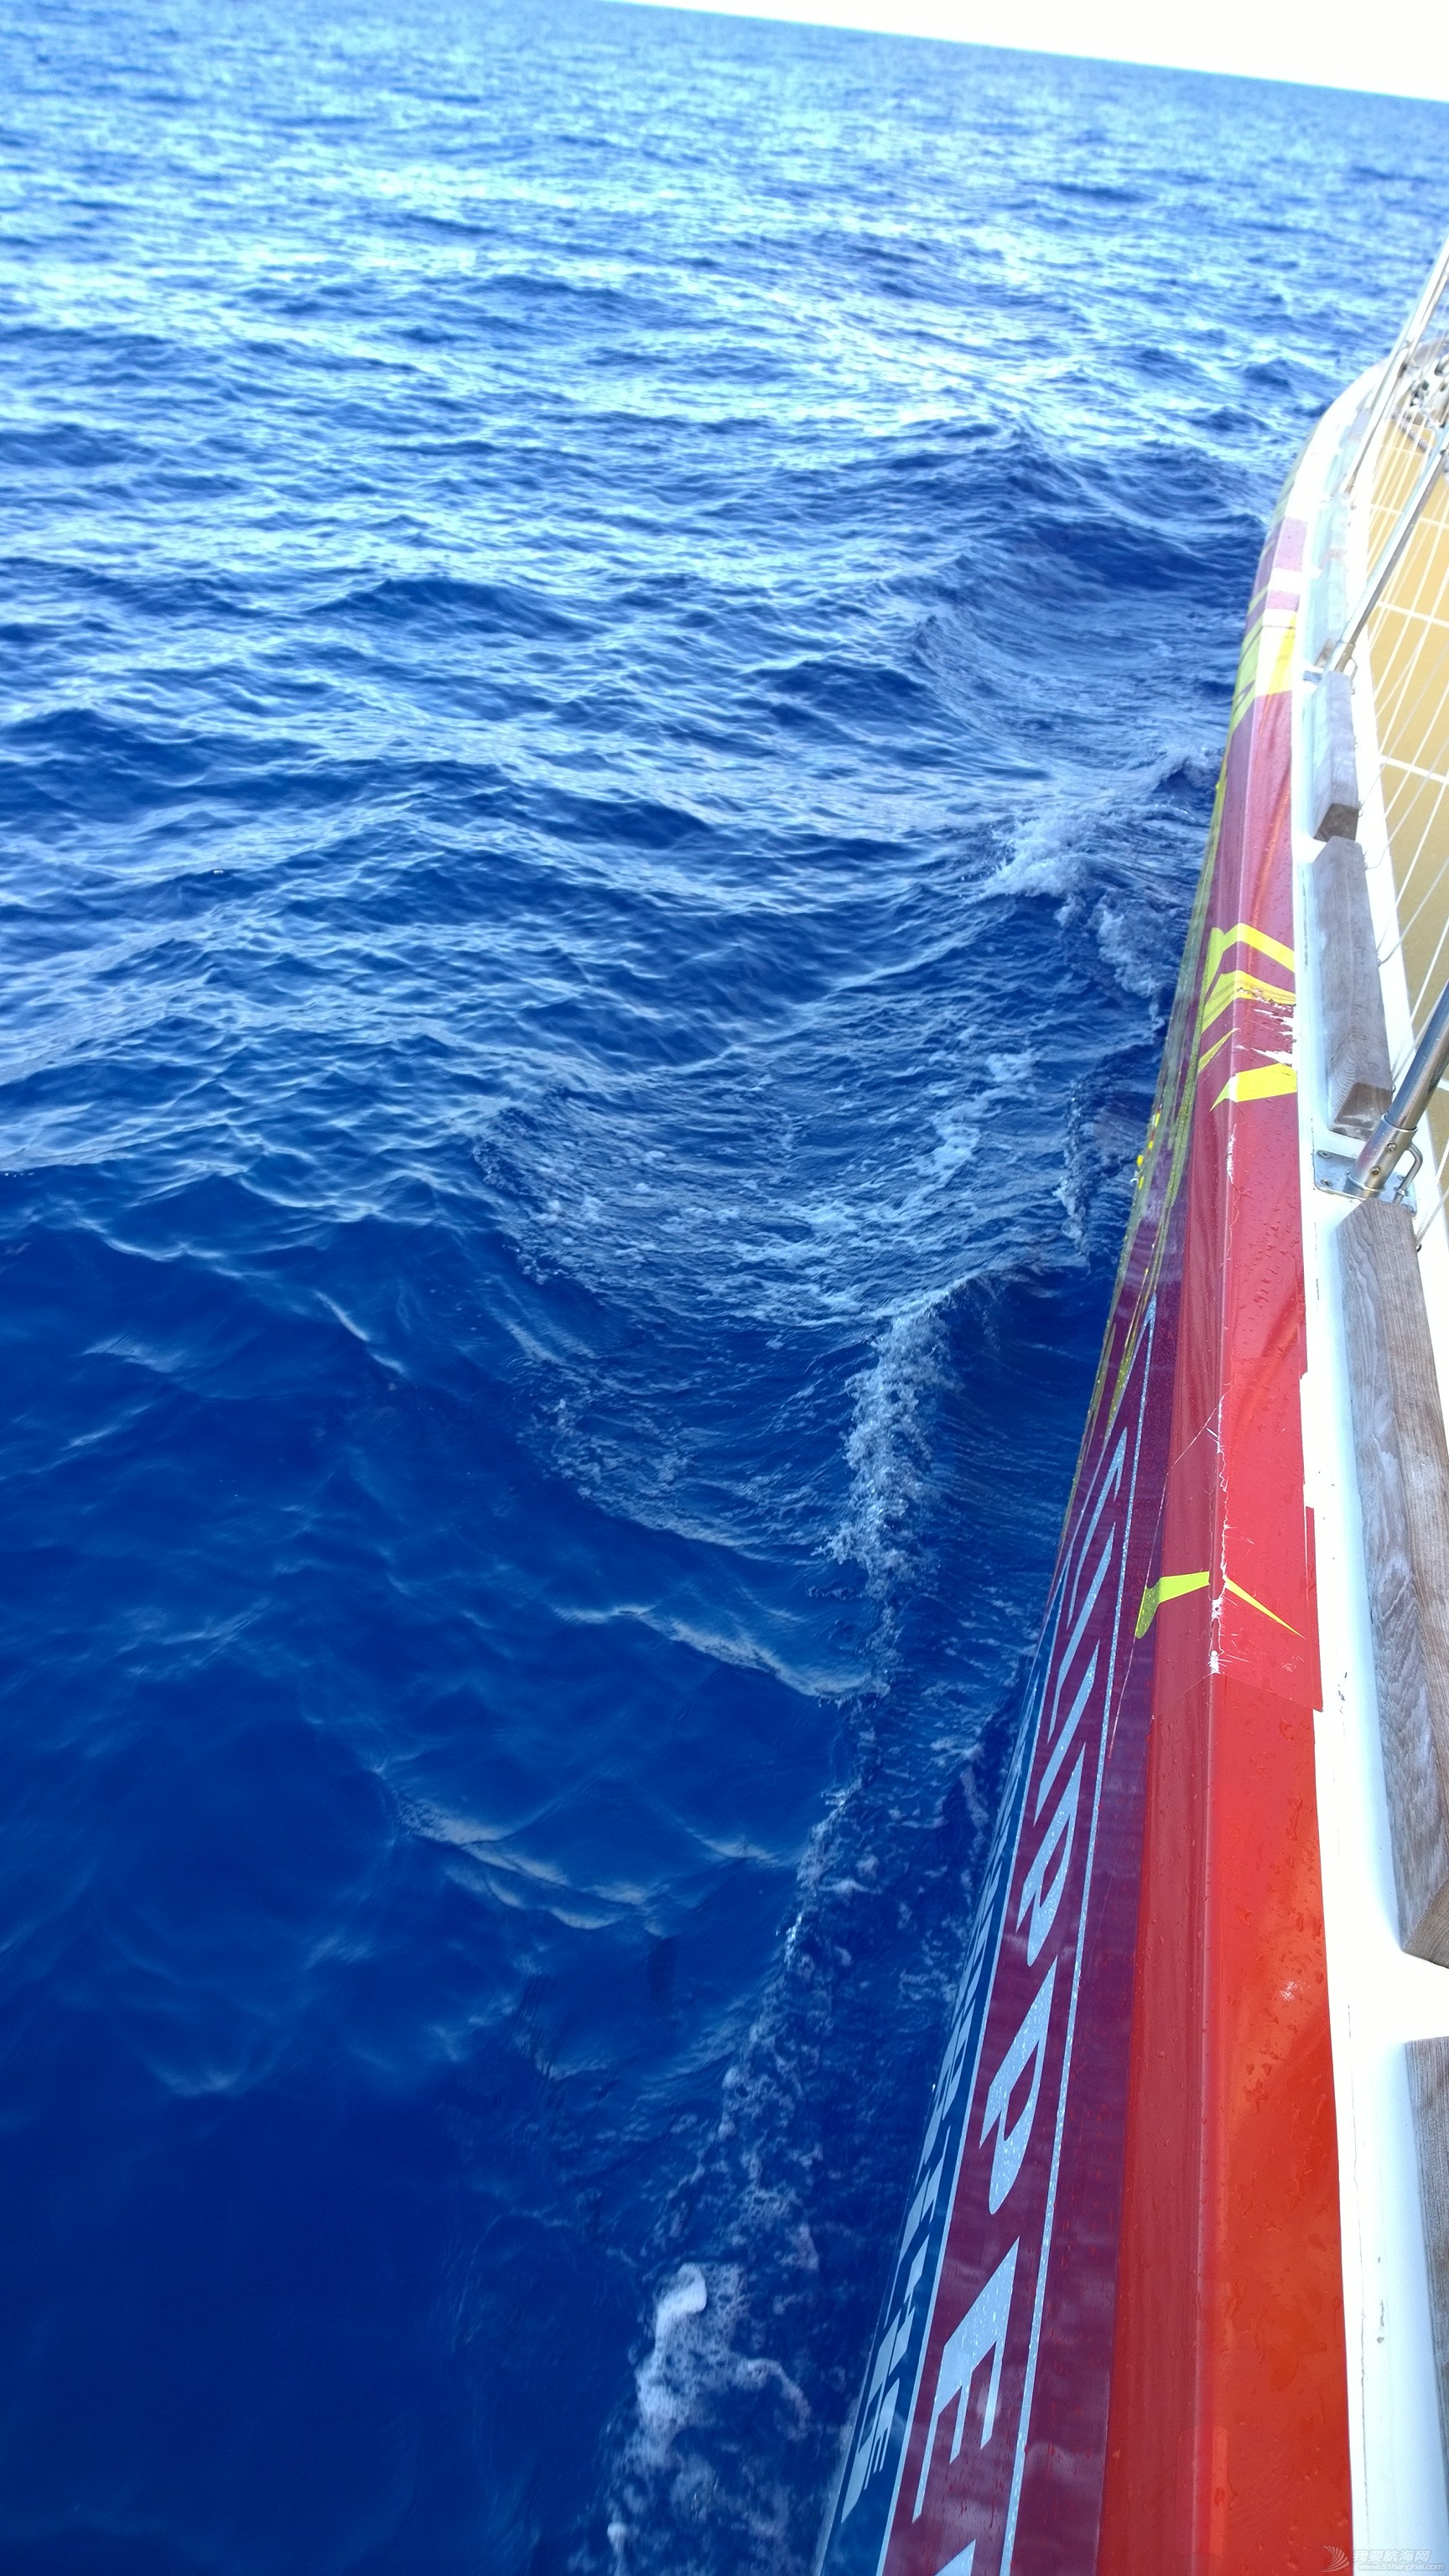 Tiffany,牙买加,大西洋,艺术家,小马哥 从水手的蓝色情结说起----写在15-16克利伯英国培训启程前夕 WP_20140527_17_03_56_Pro.jpg